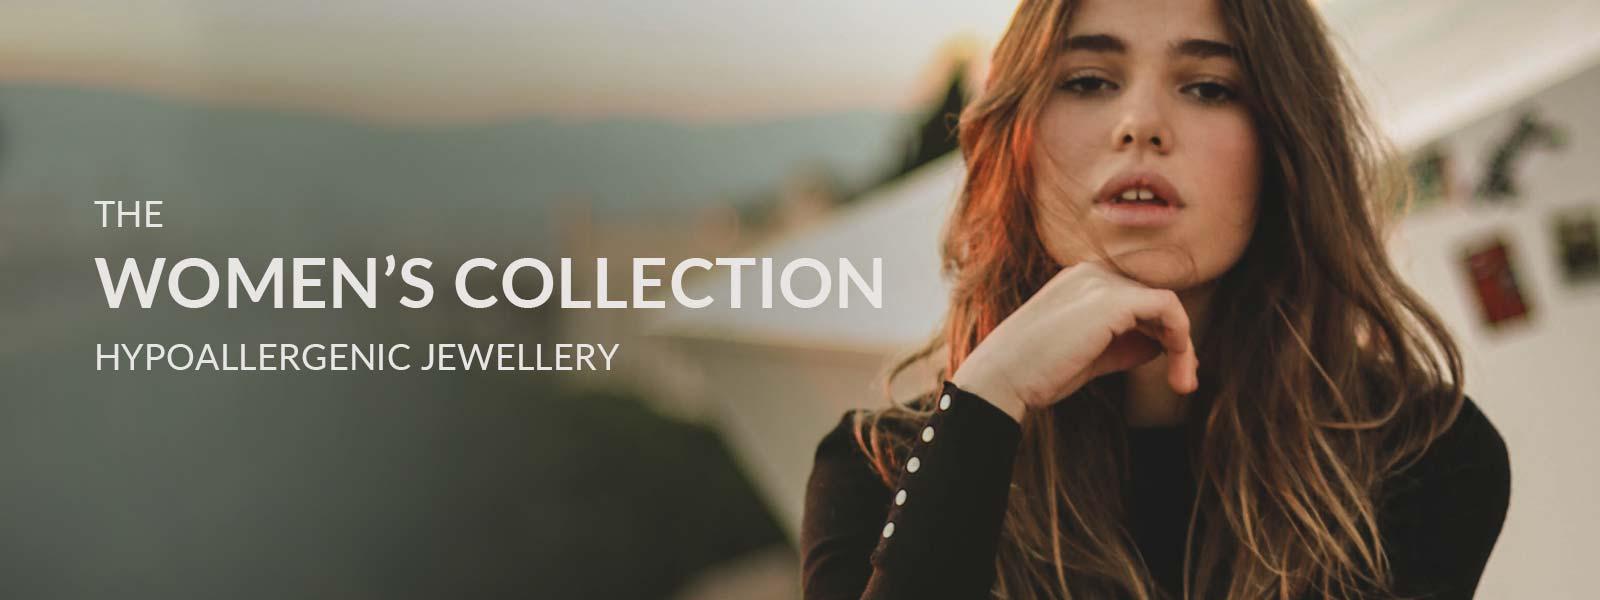 The Women's Collection of Hypoallergenic Titanium Jewellery